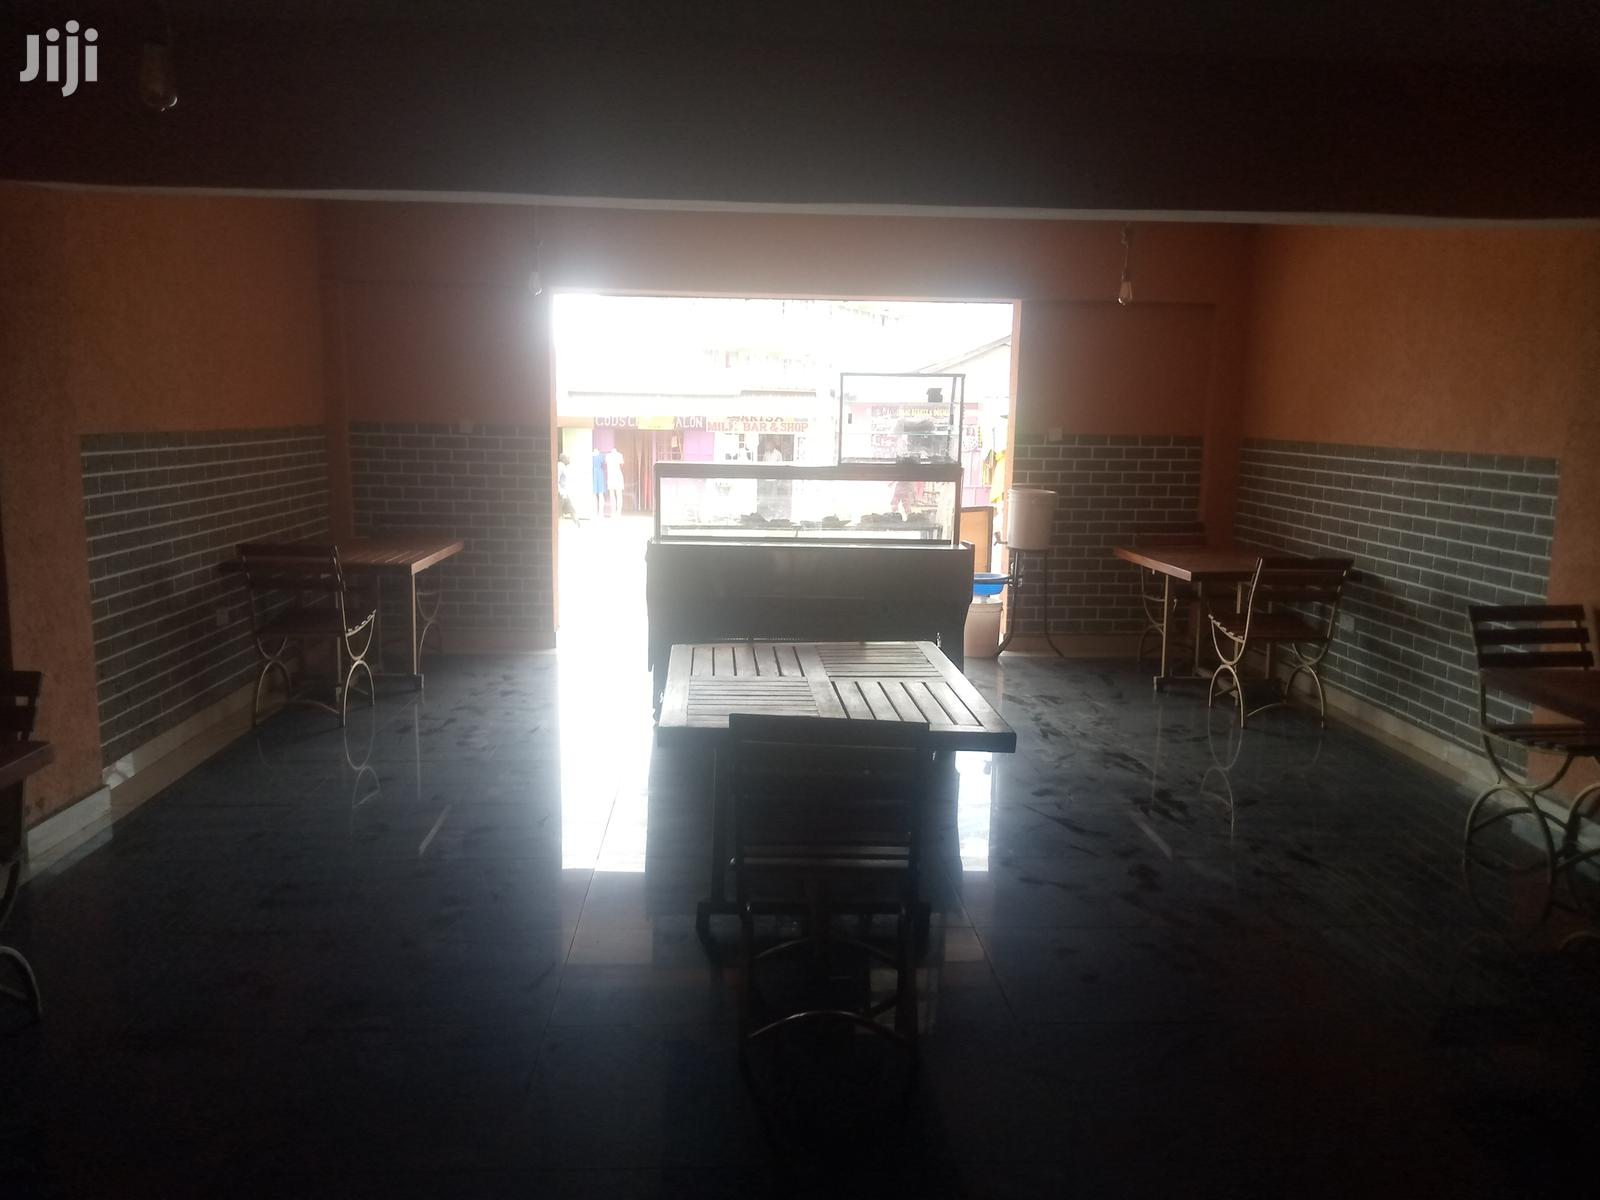 Restaurant For Sale | Commercial Property For Rent for sale in Embakasi, Nairobi, Kenya